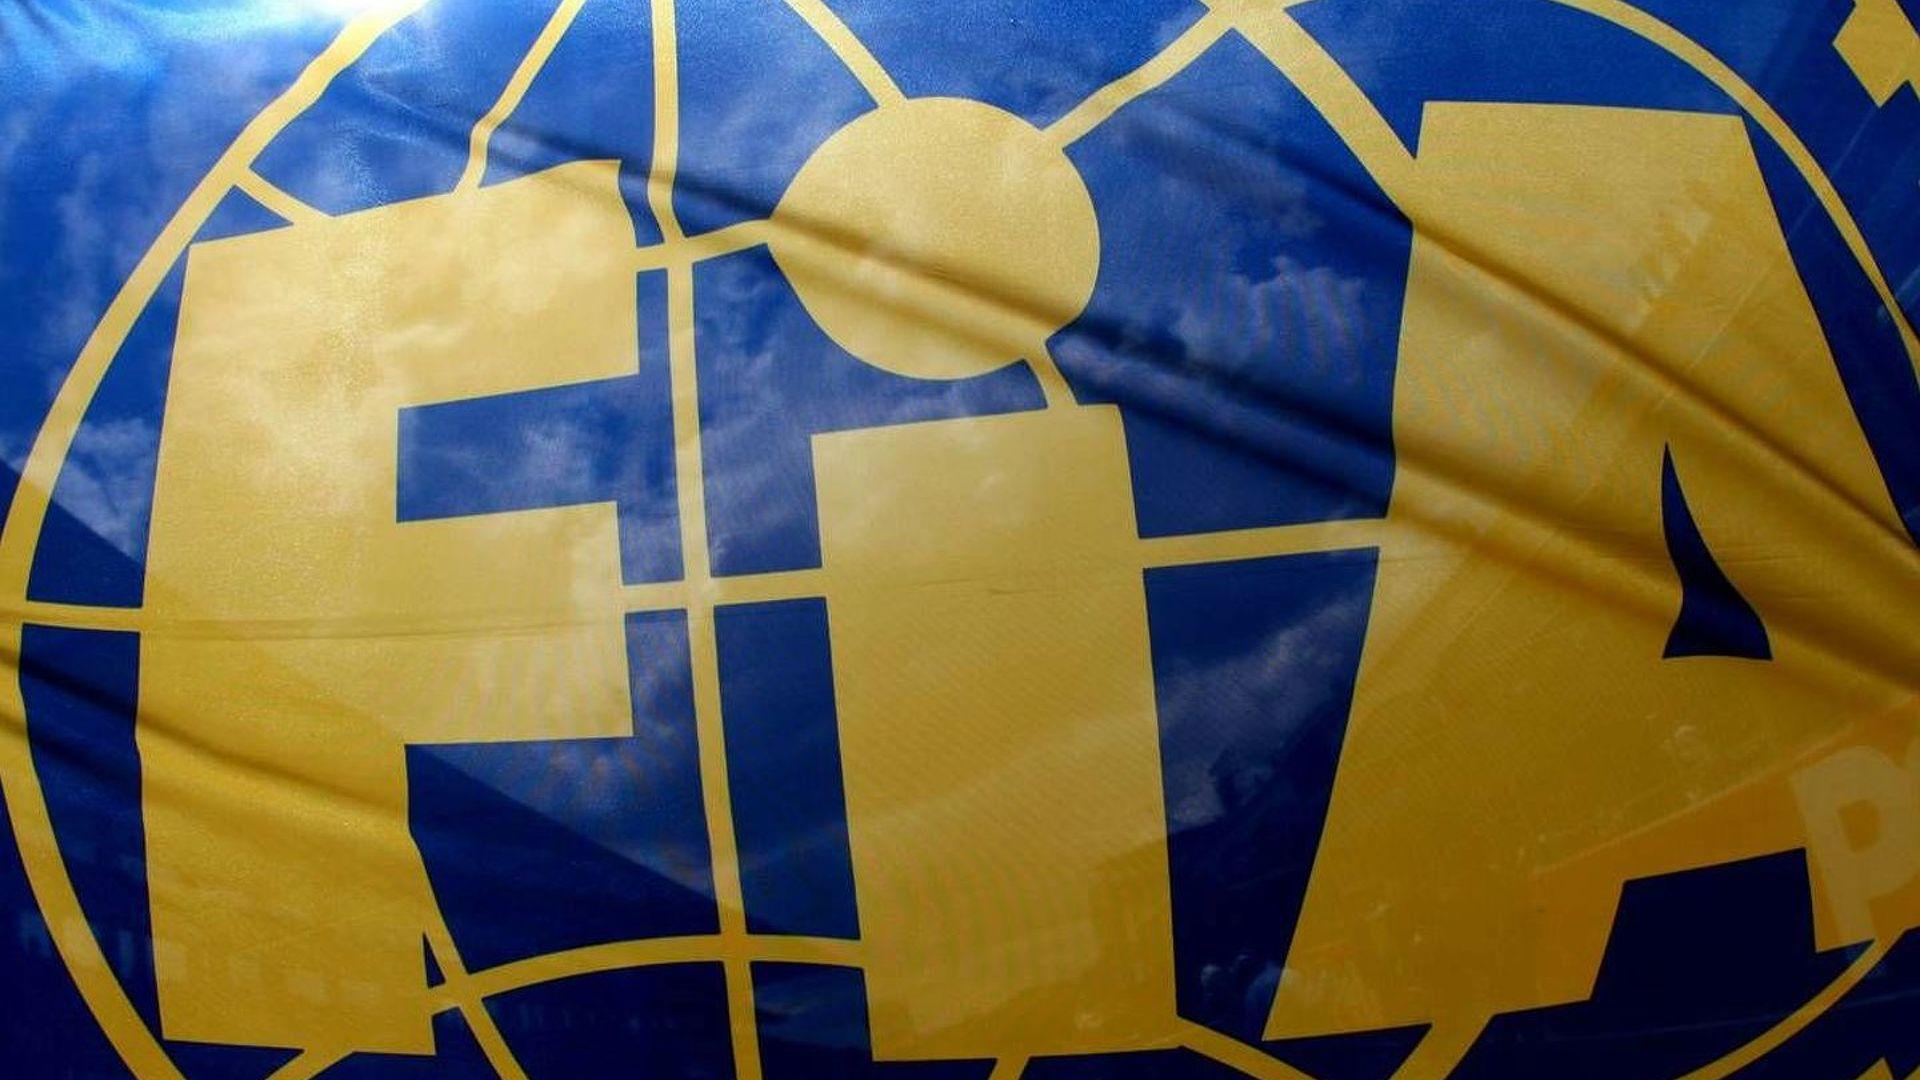 FIA confirms appeal against crashgate ruling